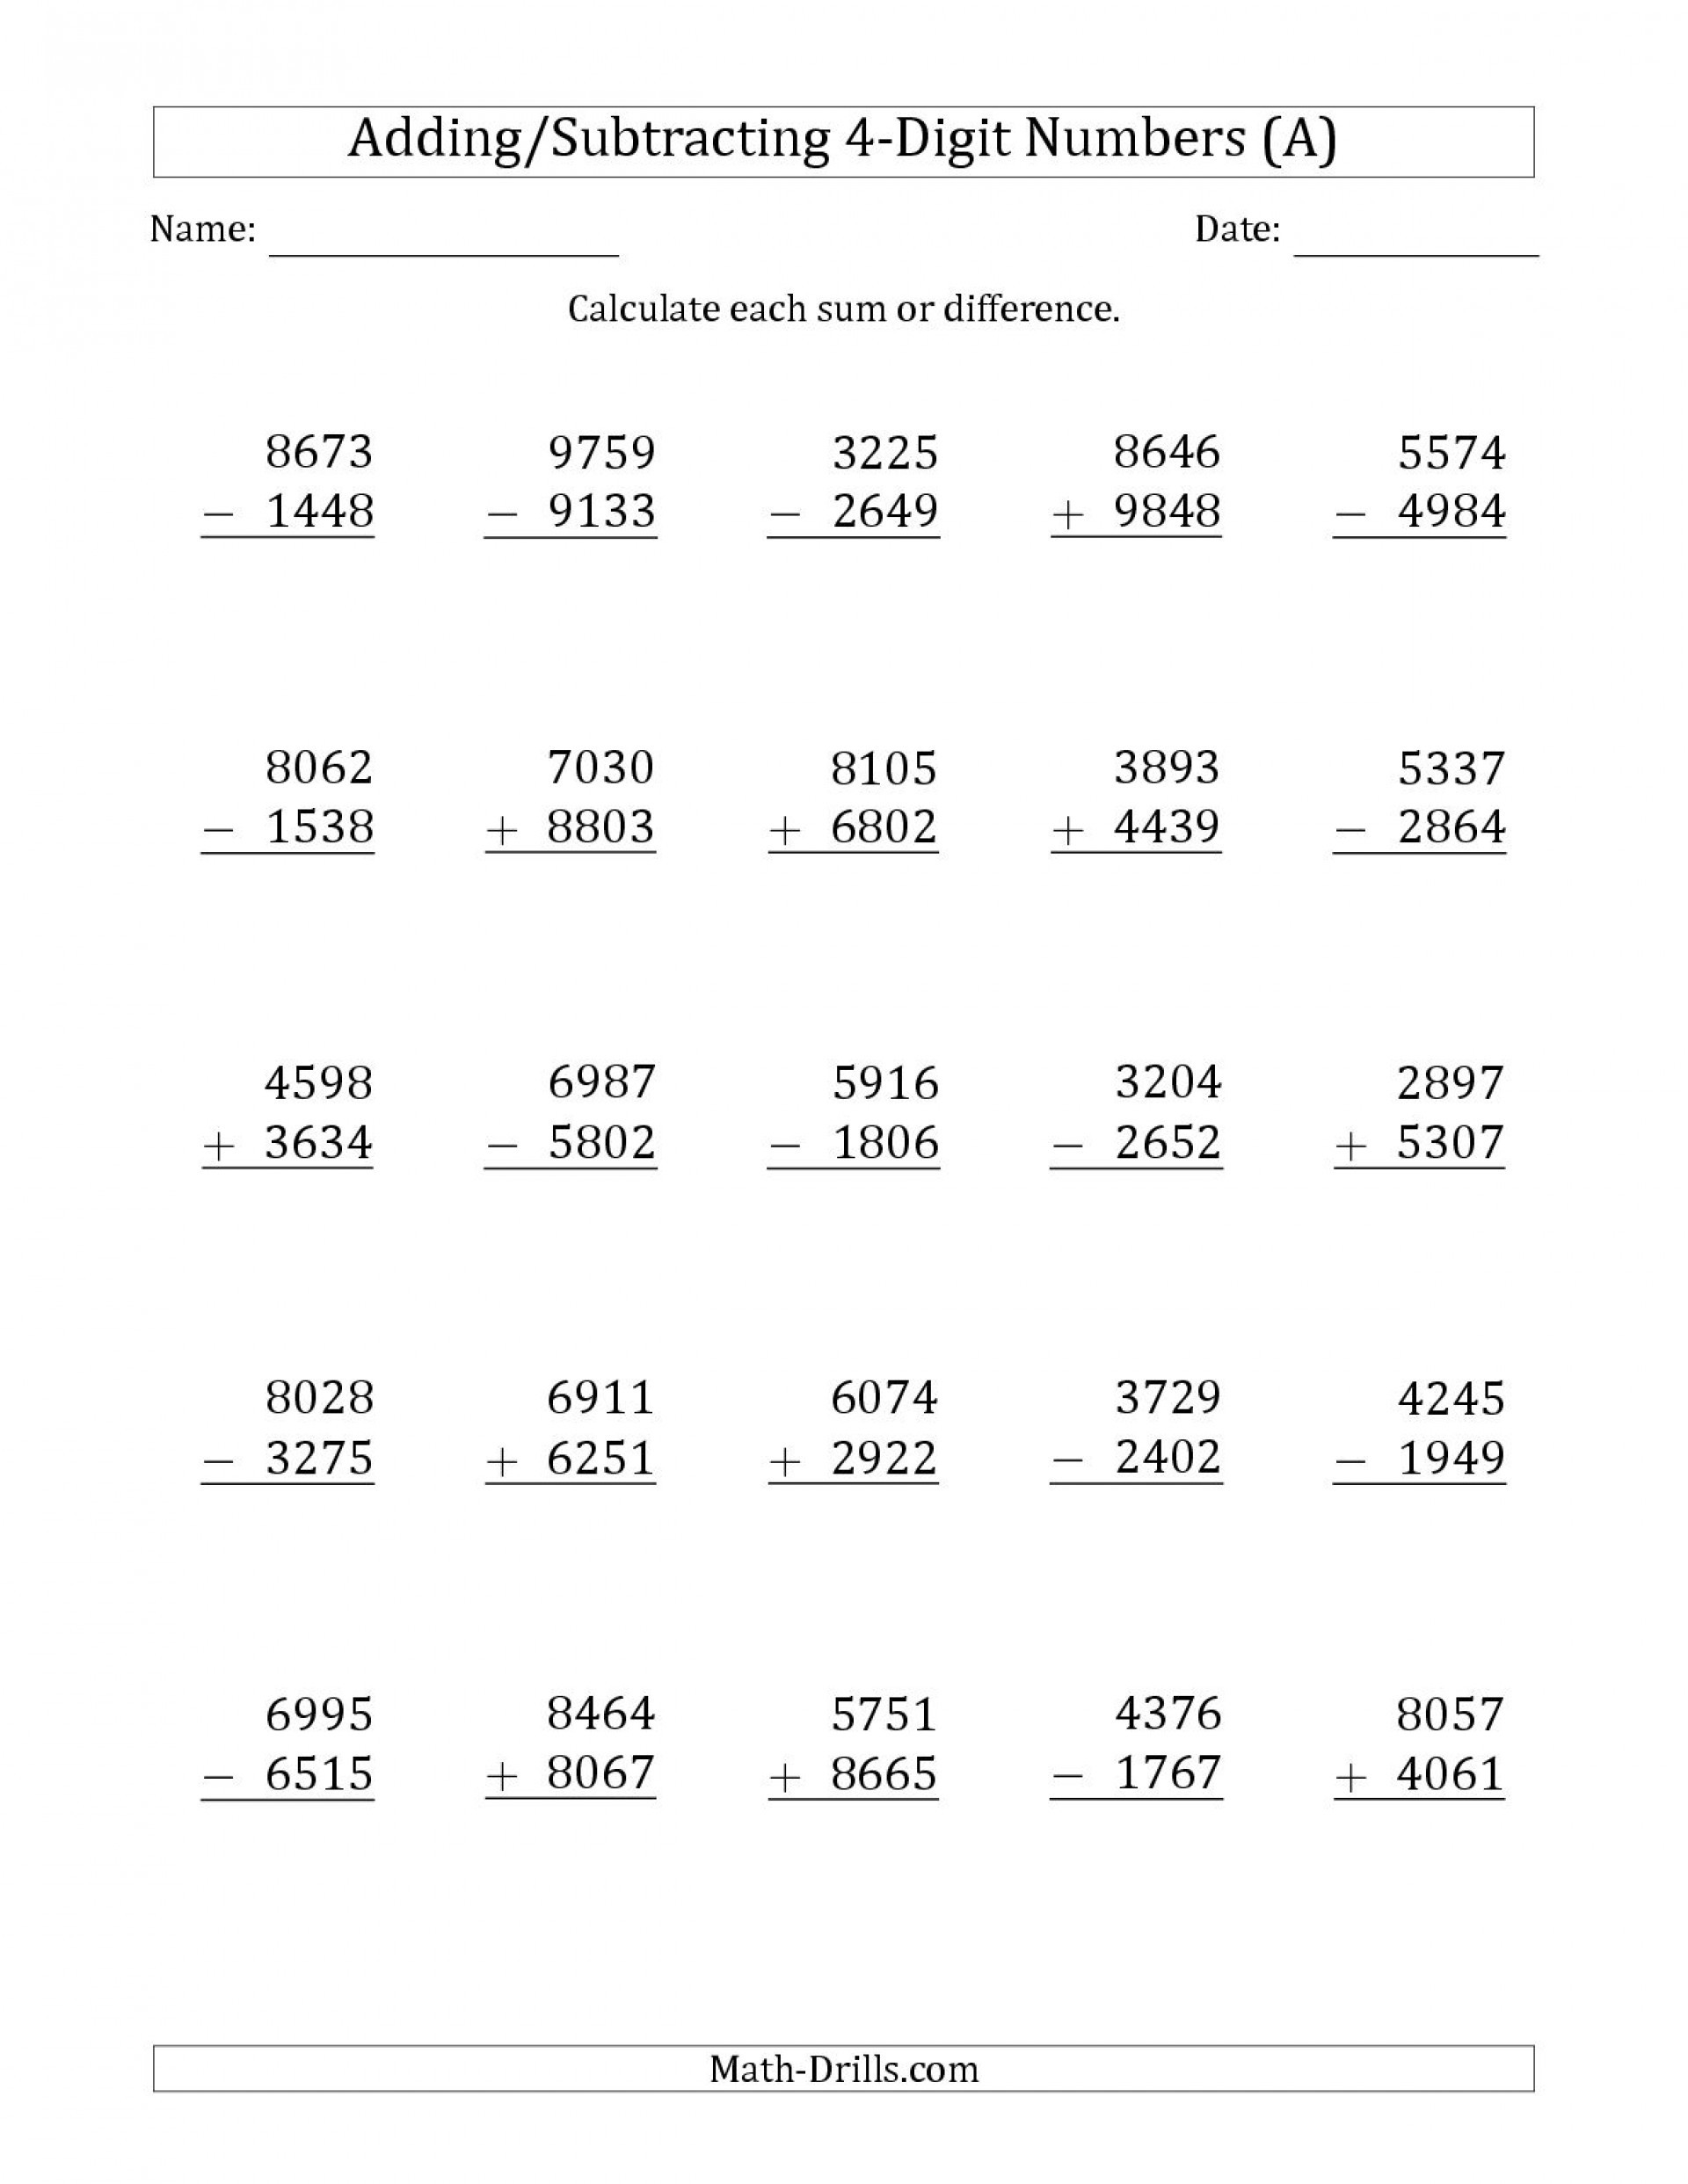 5 Free Math Worksheets Third Grade 3 Addition Add 3 Digit